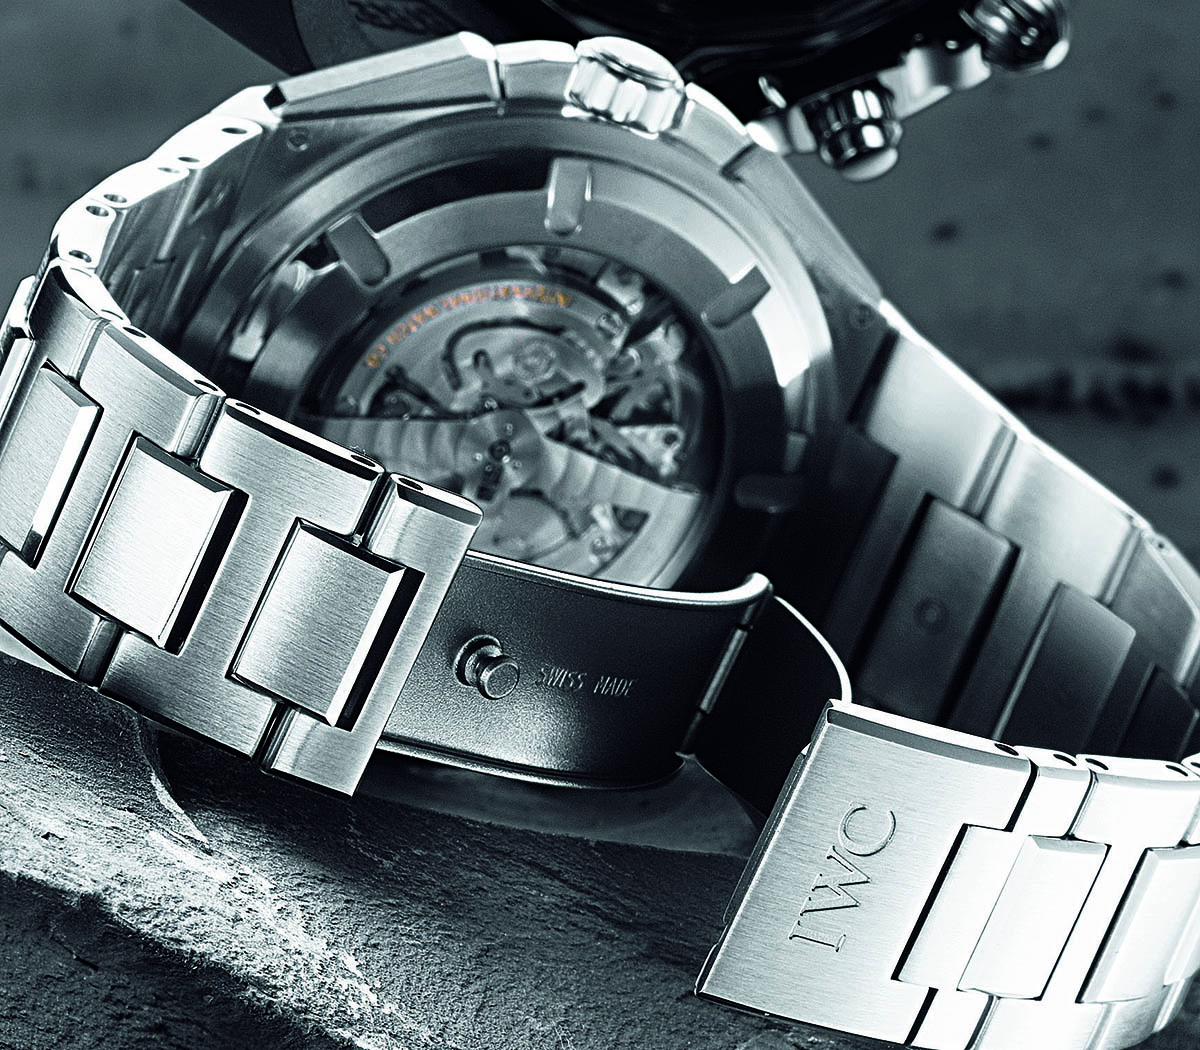 Comparative Review - Breitling Chronomat B01 vs. IWC Ingenieur Chronograph - 7